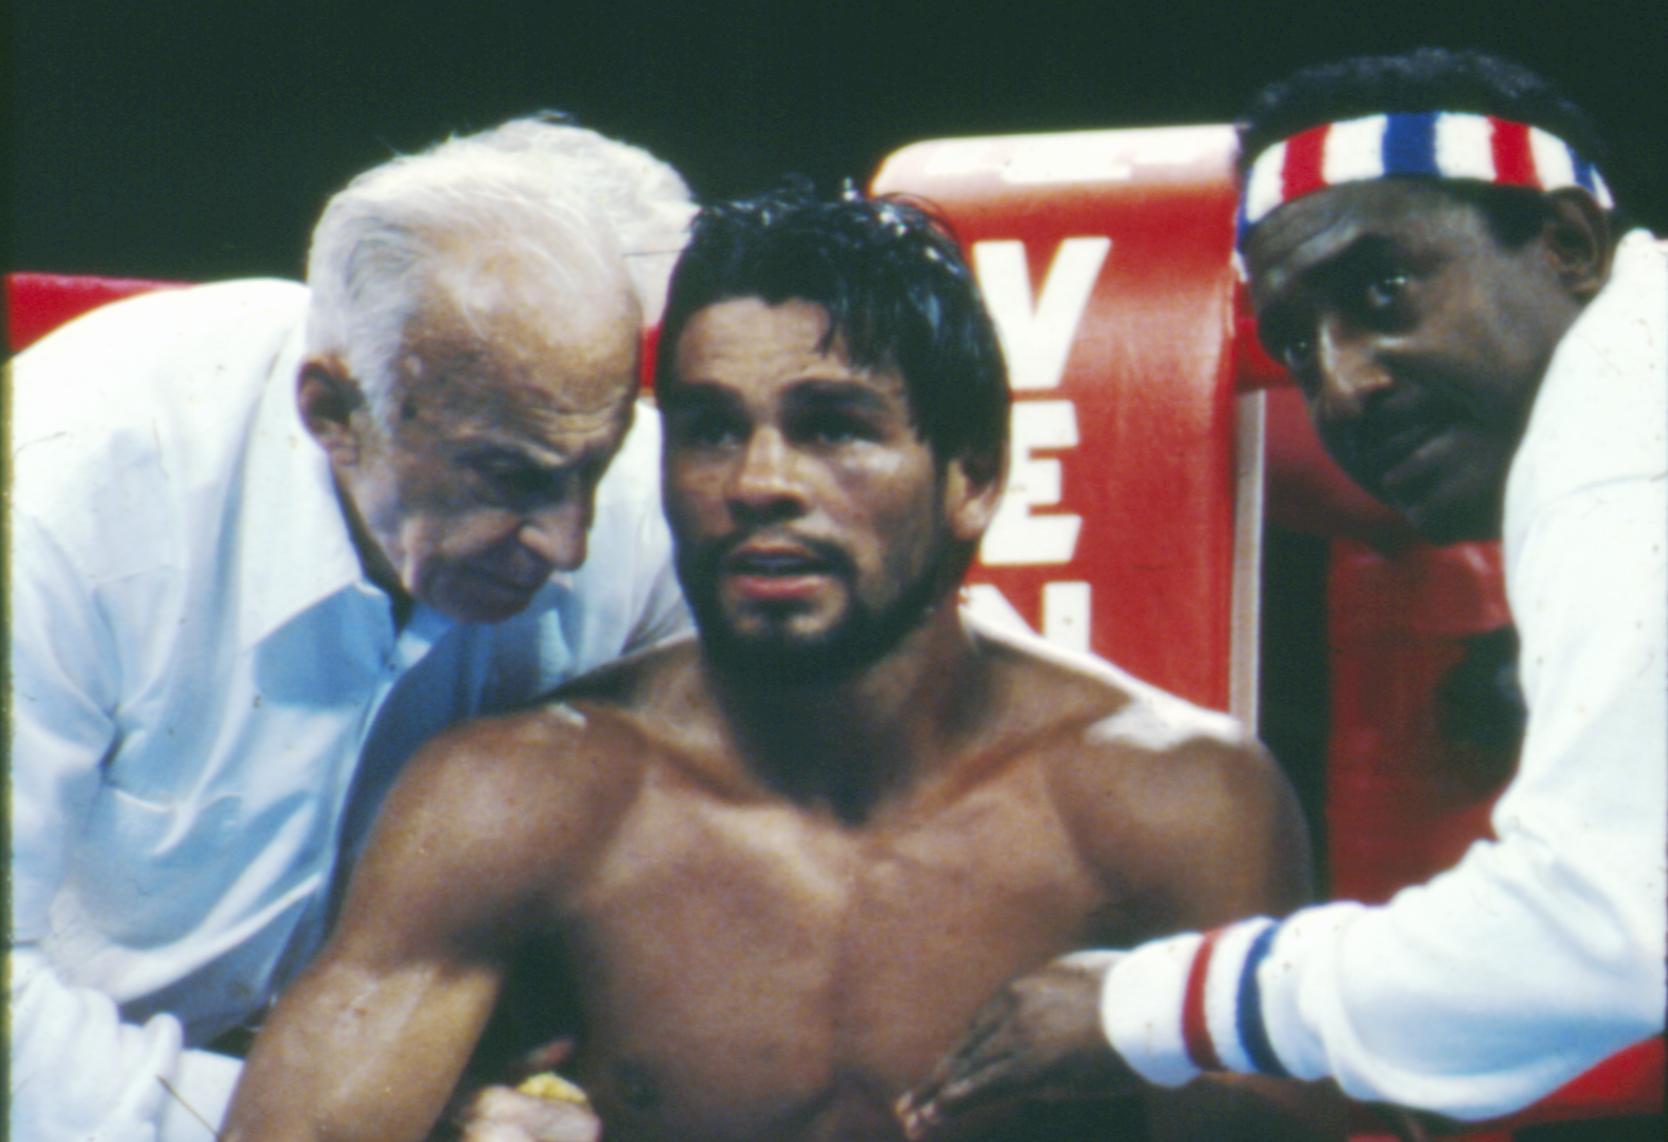 TRAILER: 'I Am Durán' Doc Chronicles the Life and Legend of Panamanian Boxer Roberto Durán